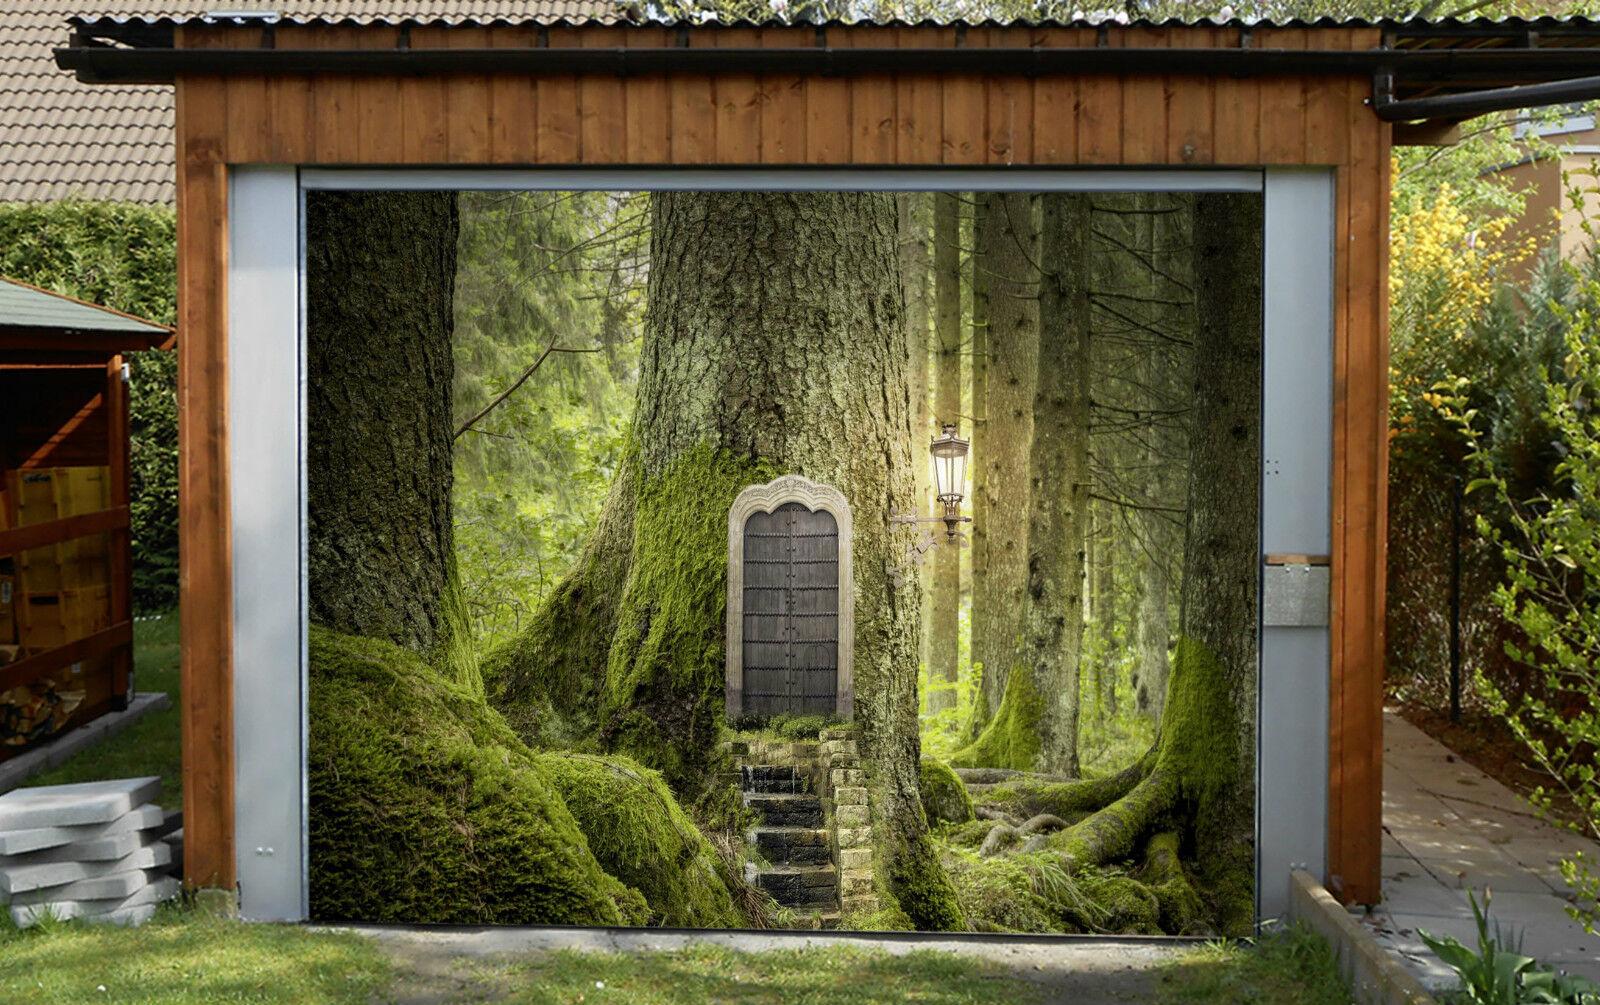 3D Tree House 303 Garage Door Murals Wall Print Decal Wall Deco AJ WALLPAPER IE